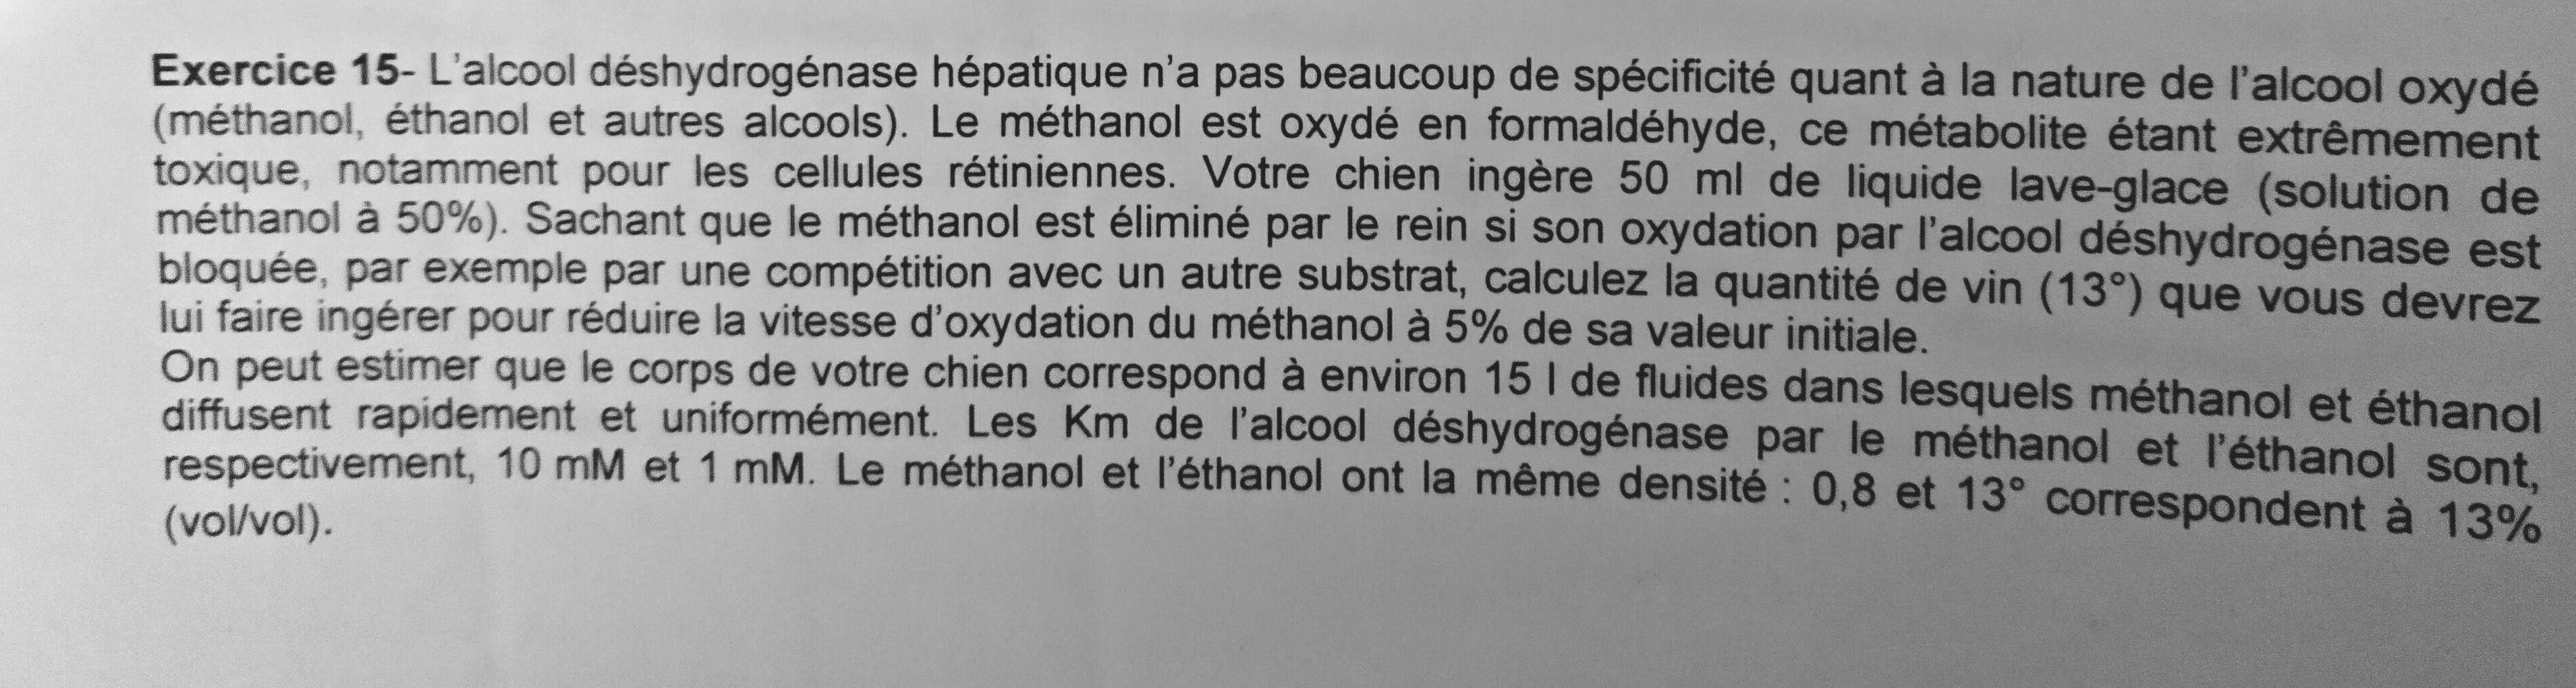 éthanol-méthanol-chien